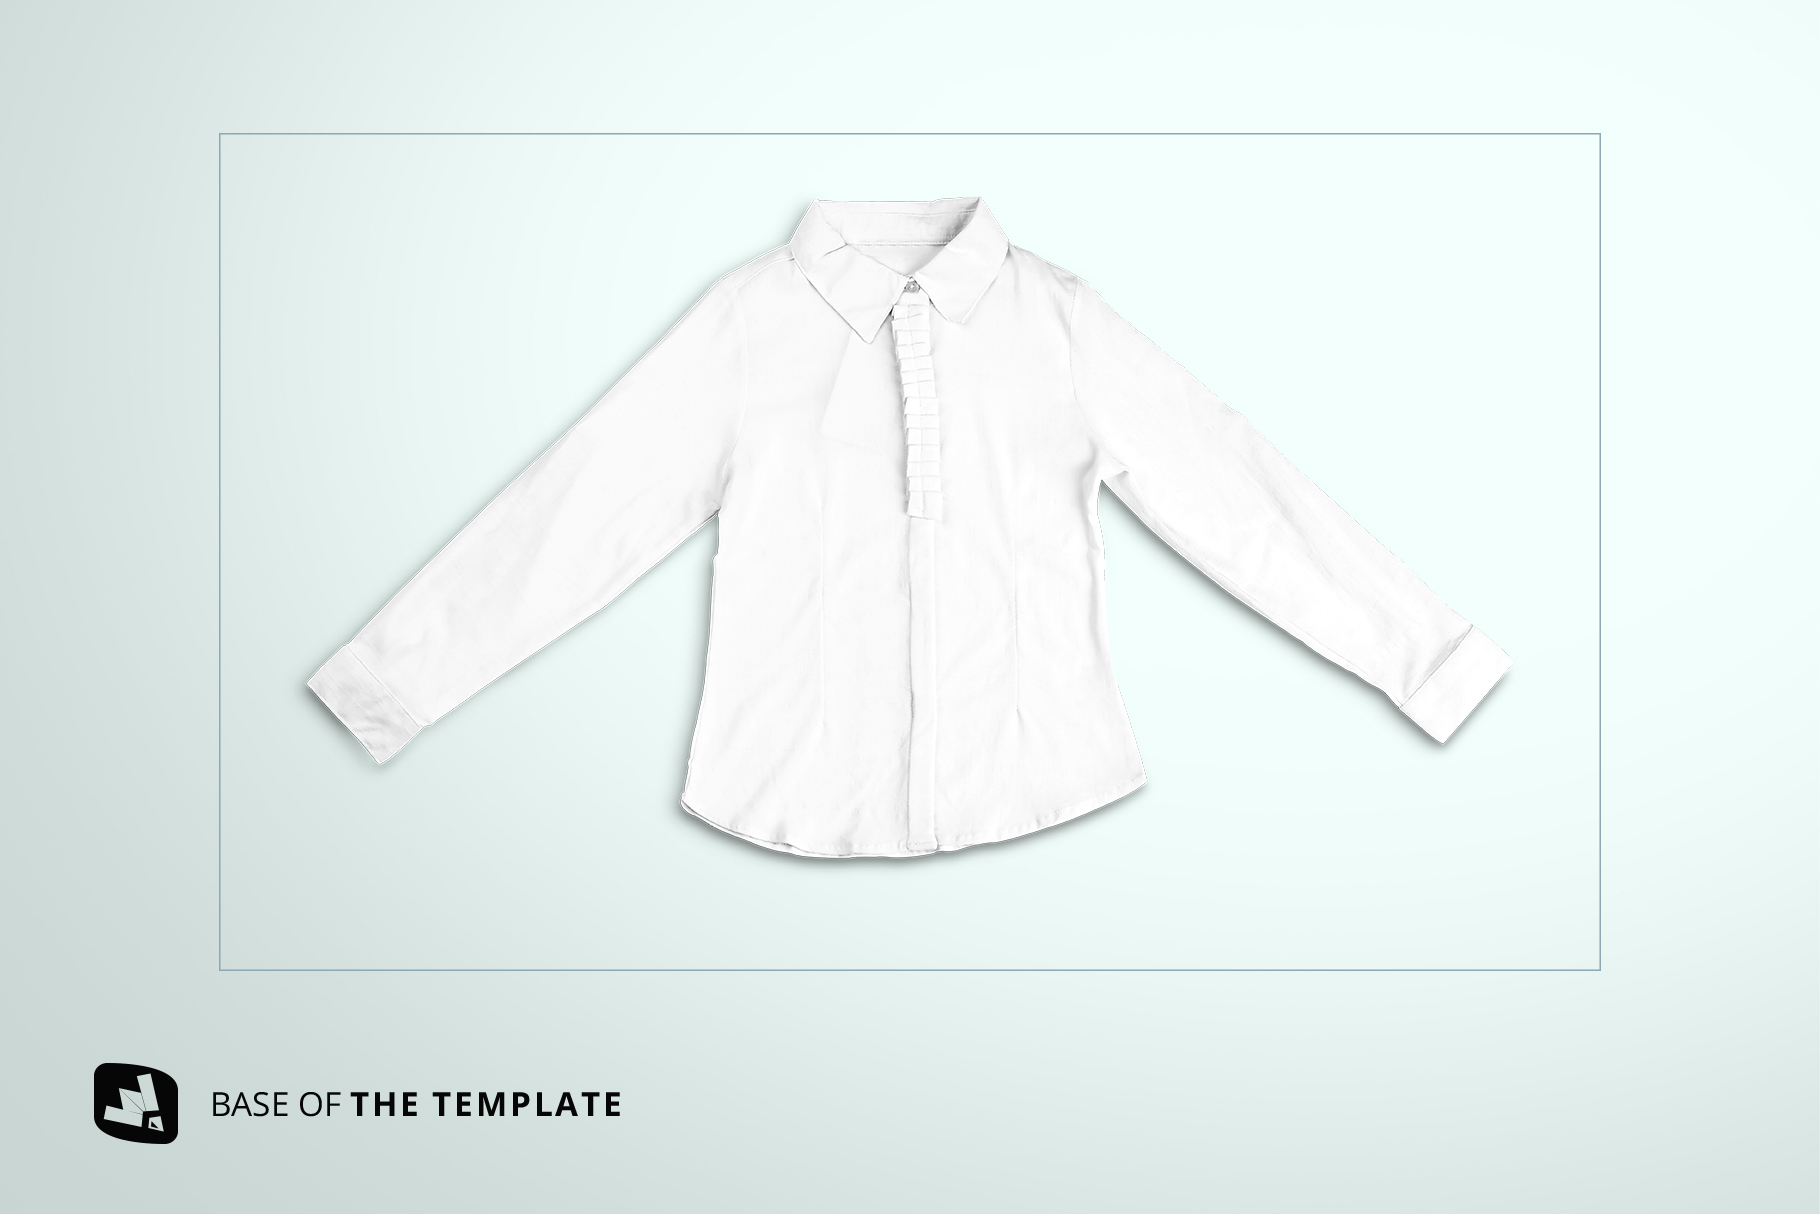 base image of the women's full sleeve blouse mockup